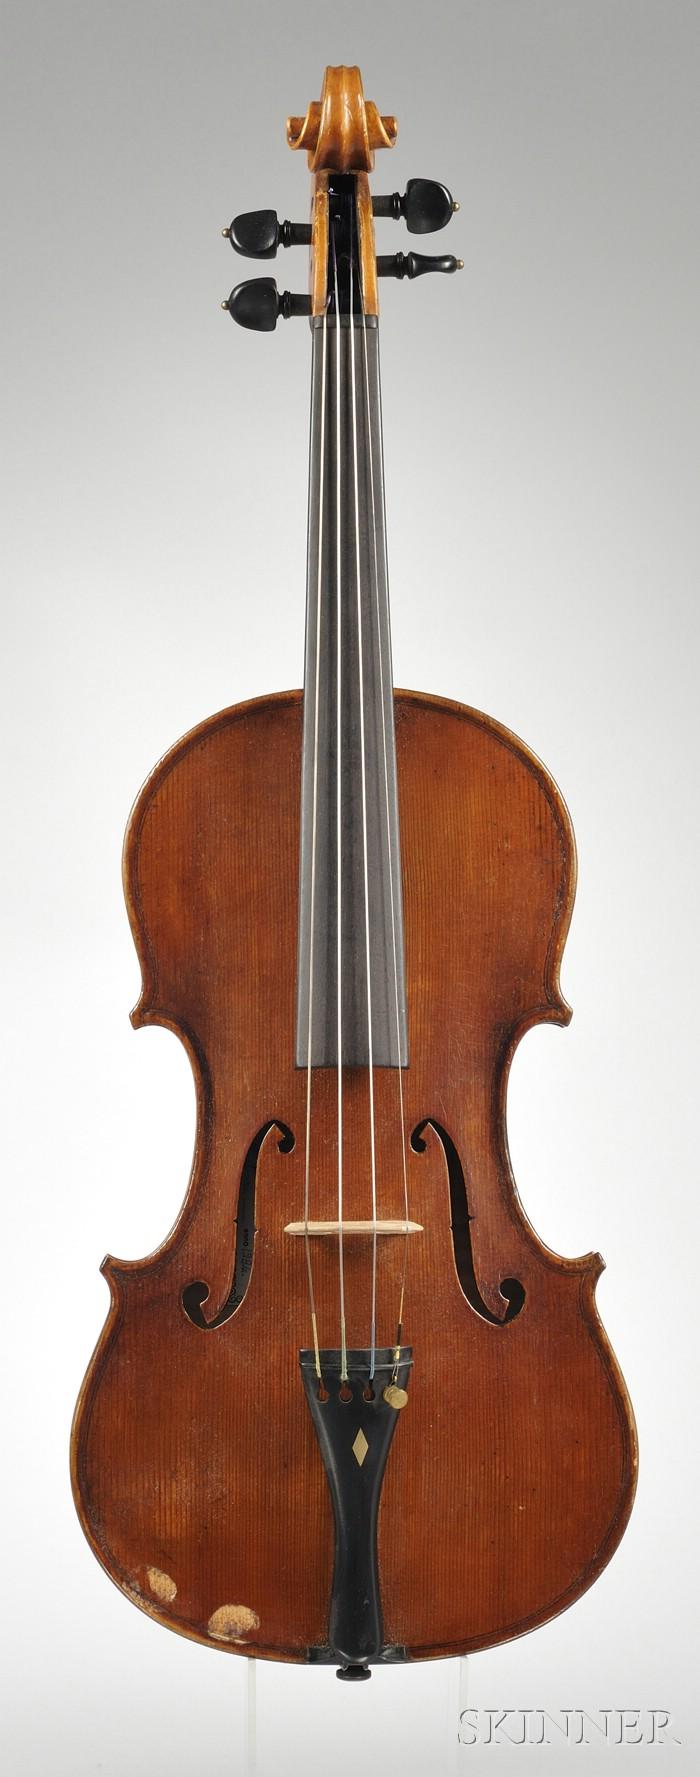 Italian Violin, Workshop of Mario Gadda, Mantua, 1986